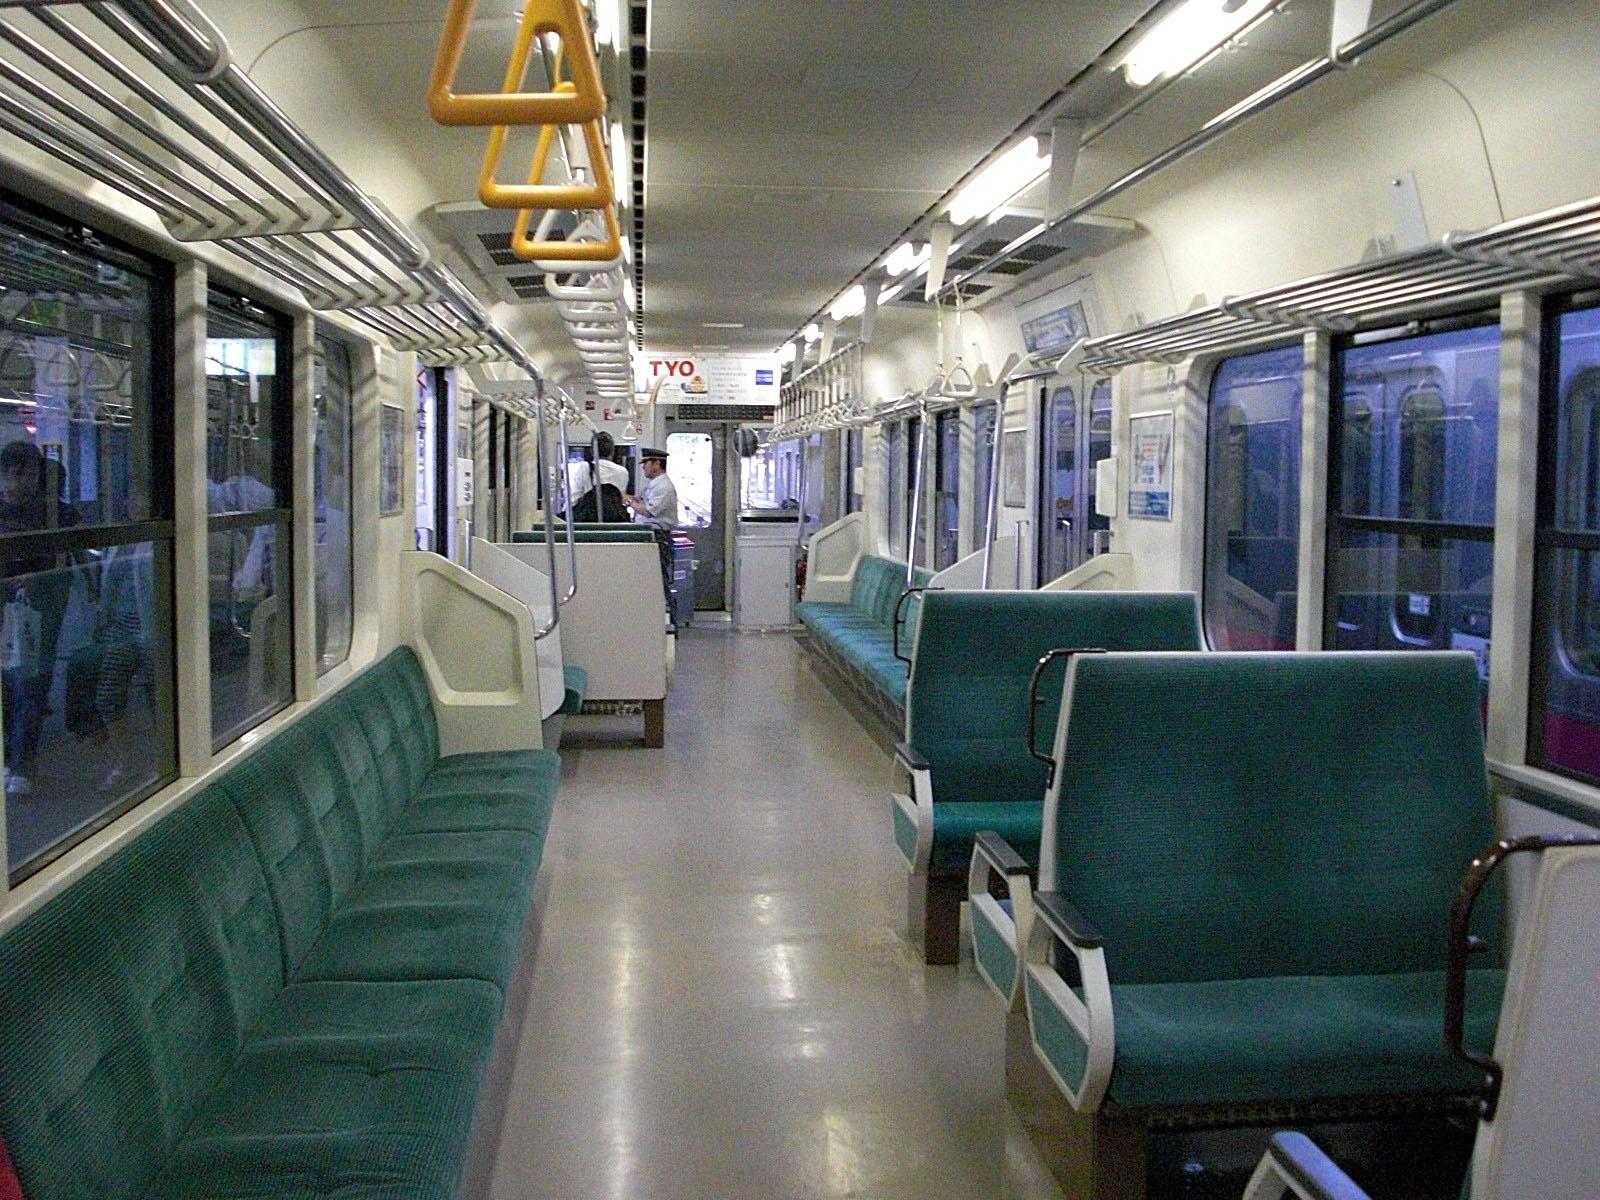 https://upload.wikimedia.org/wikipedia/commons/d/d7/JR-east-EMU-kuha700-inside%28modified%29.jpg